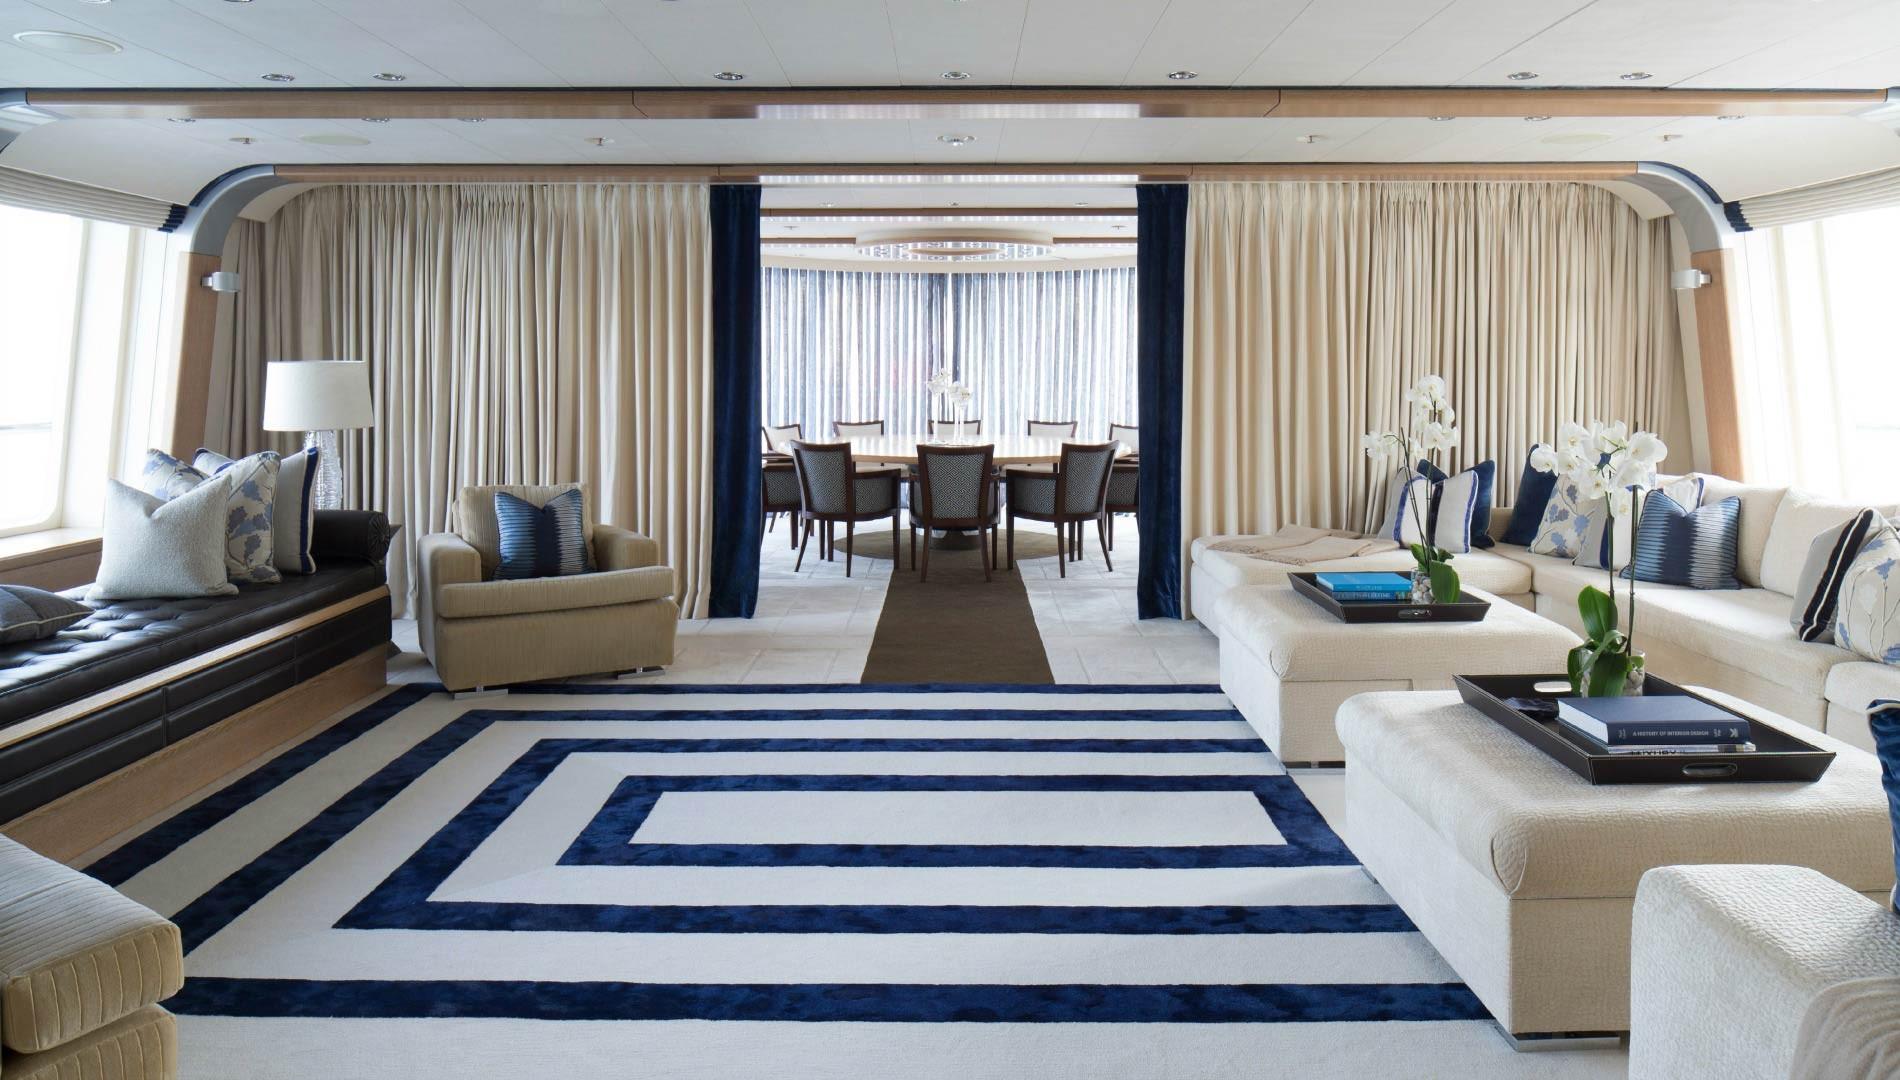 Luxury superyacht keyla interior by hot lab luxury yacht charter - Luxury Yacht Ice Angel Saloon